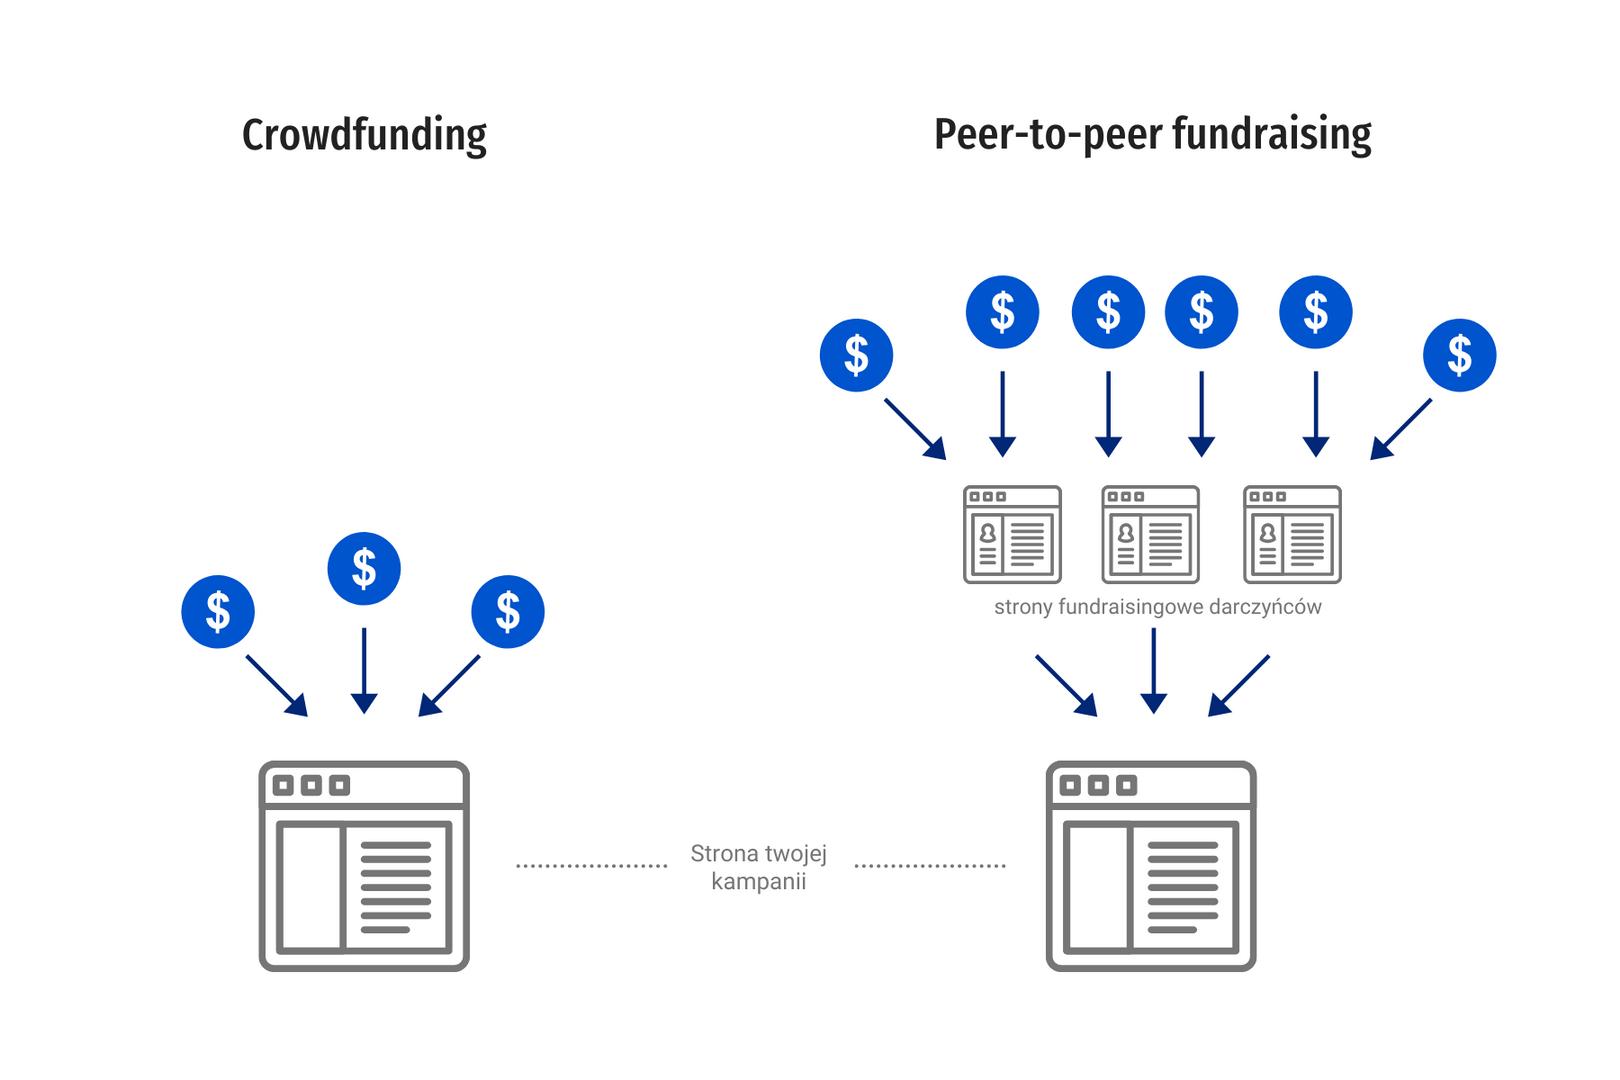 Różnice w sposobie działania crowdfundingu i peer-to-peer fundraisingu